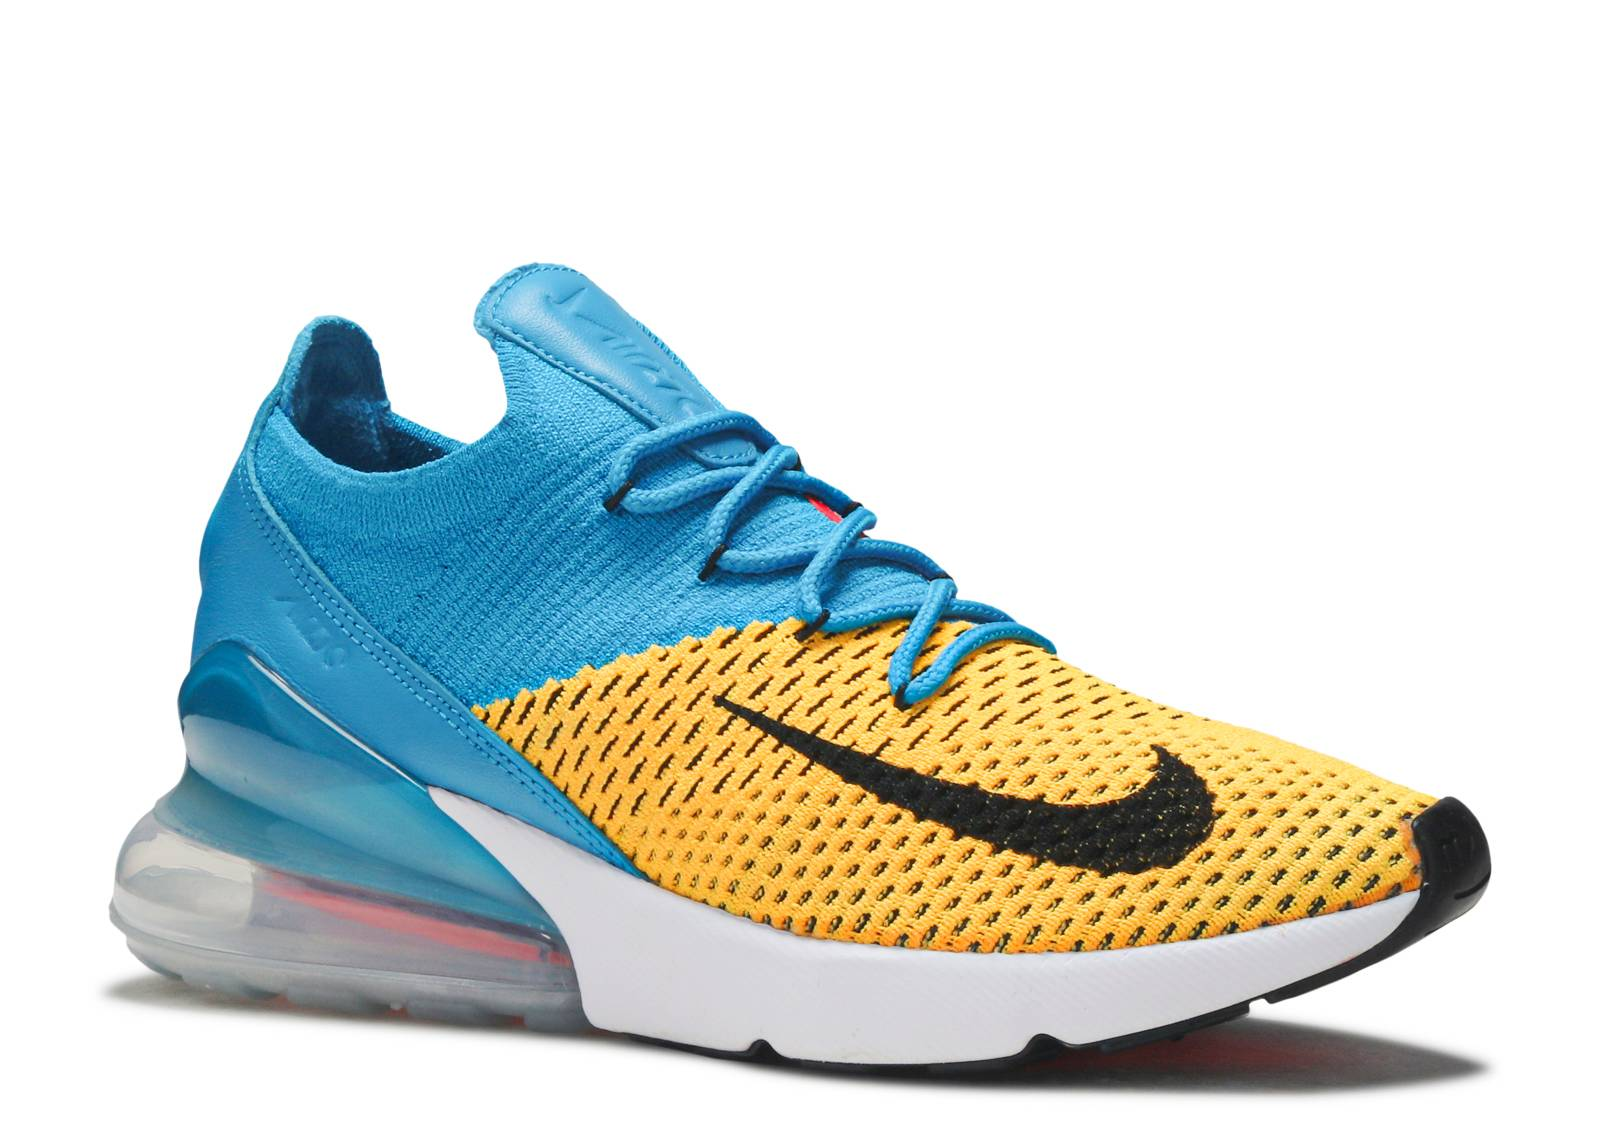 low priced 980c4 6d7c6 Air Max 270 Flyknit - Nike - ao1023 800 - laser orange blue orbit   Flight  Club